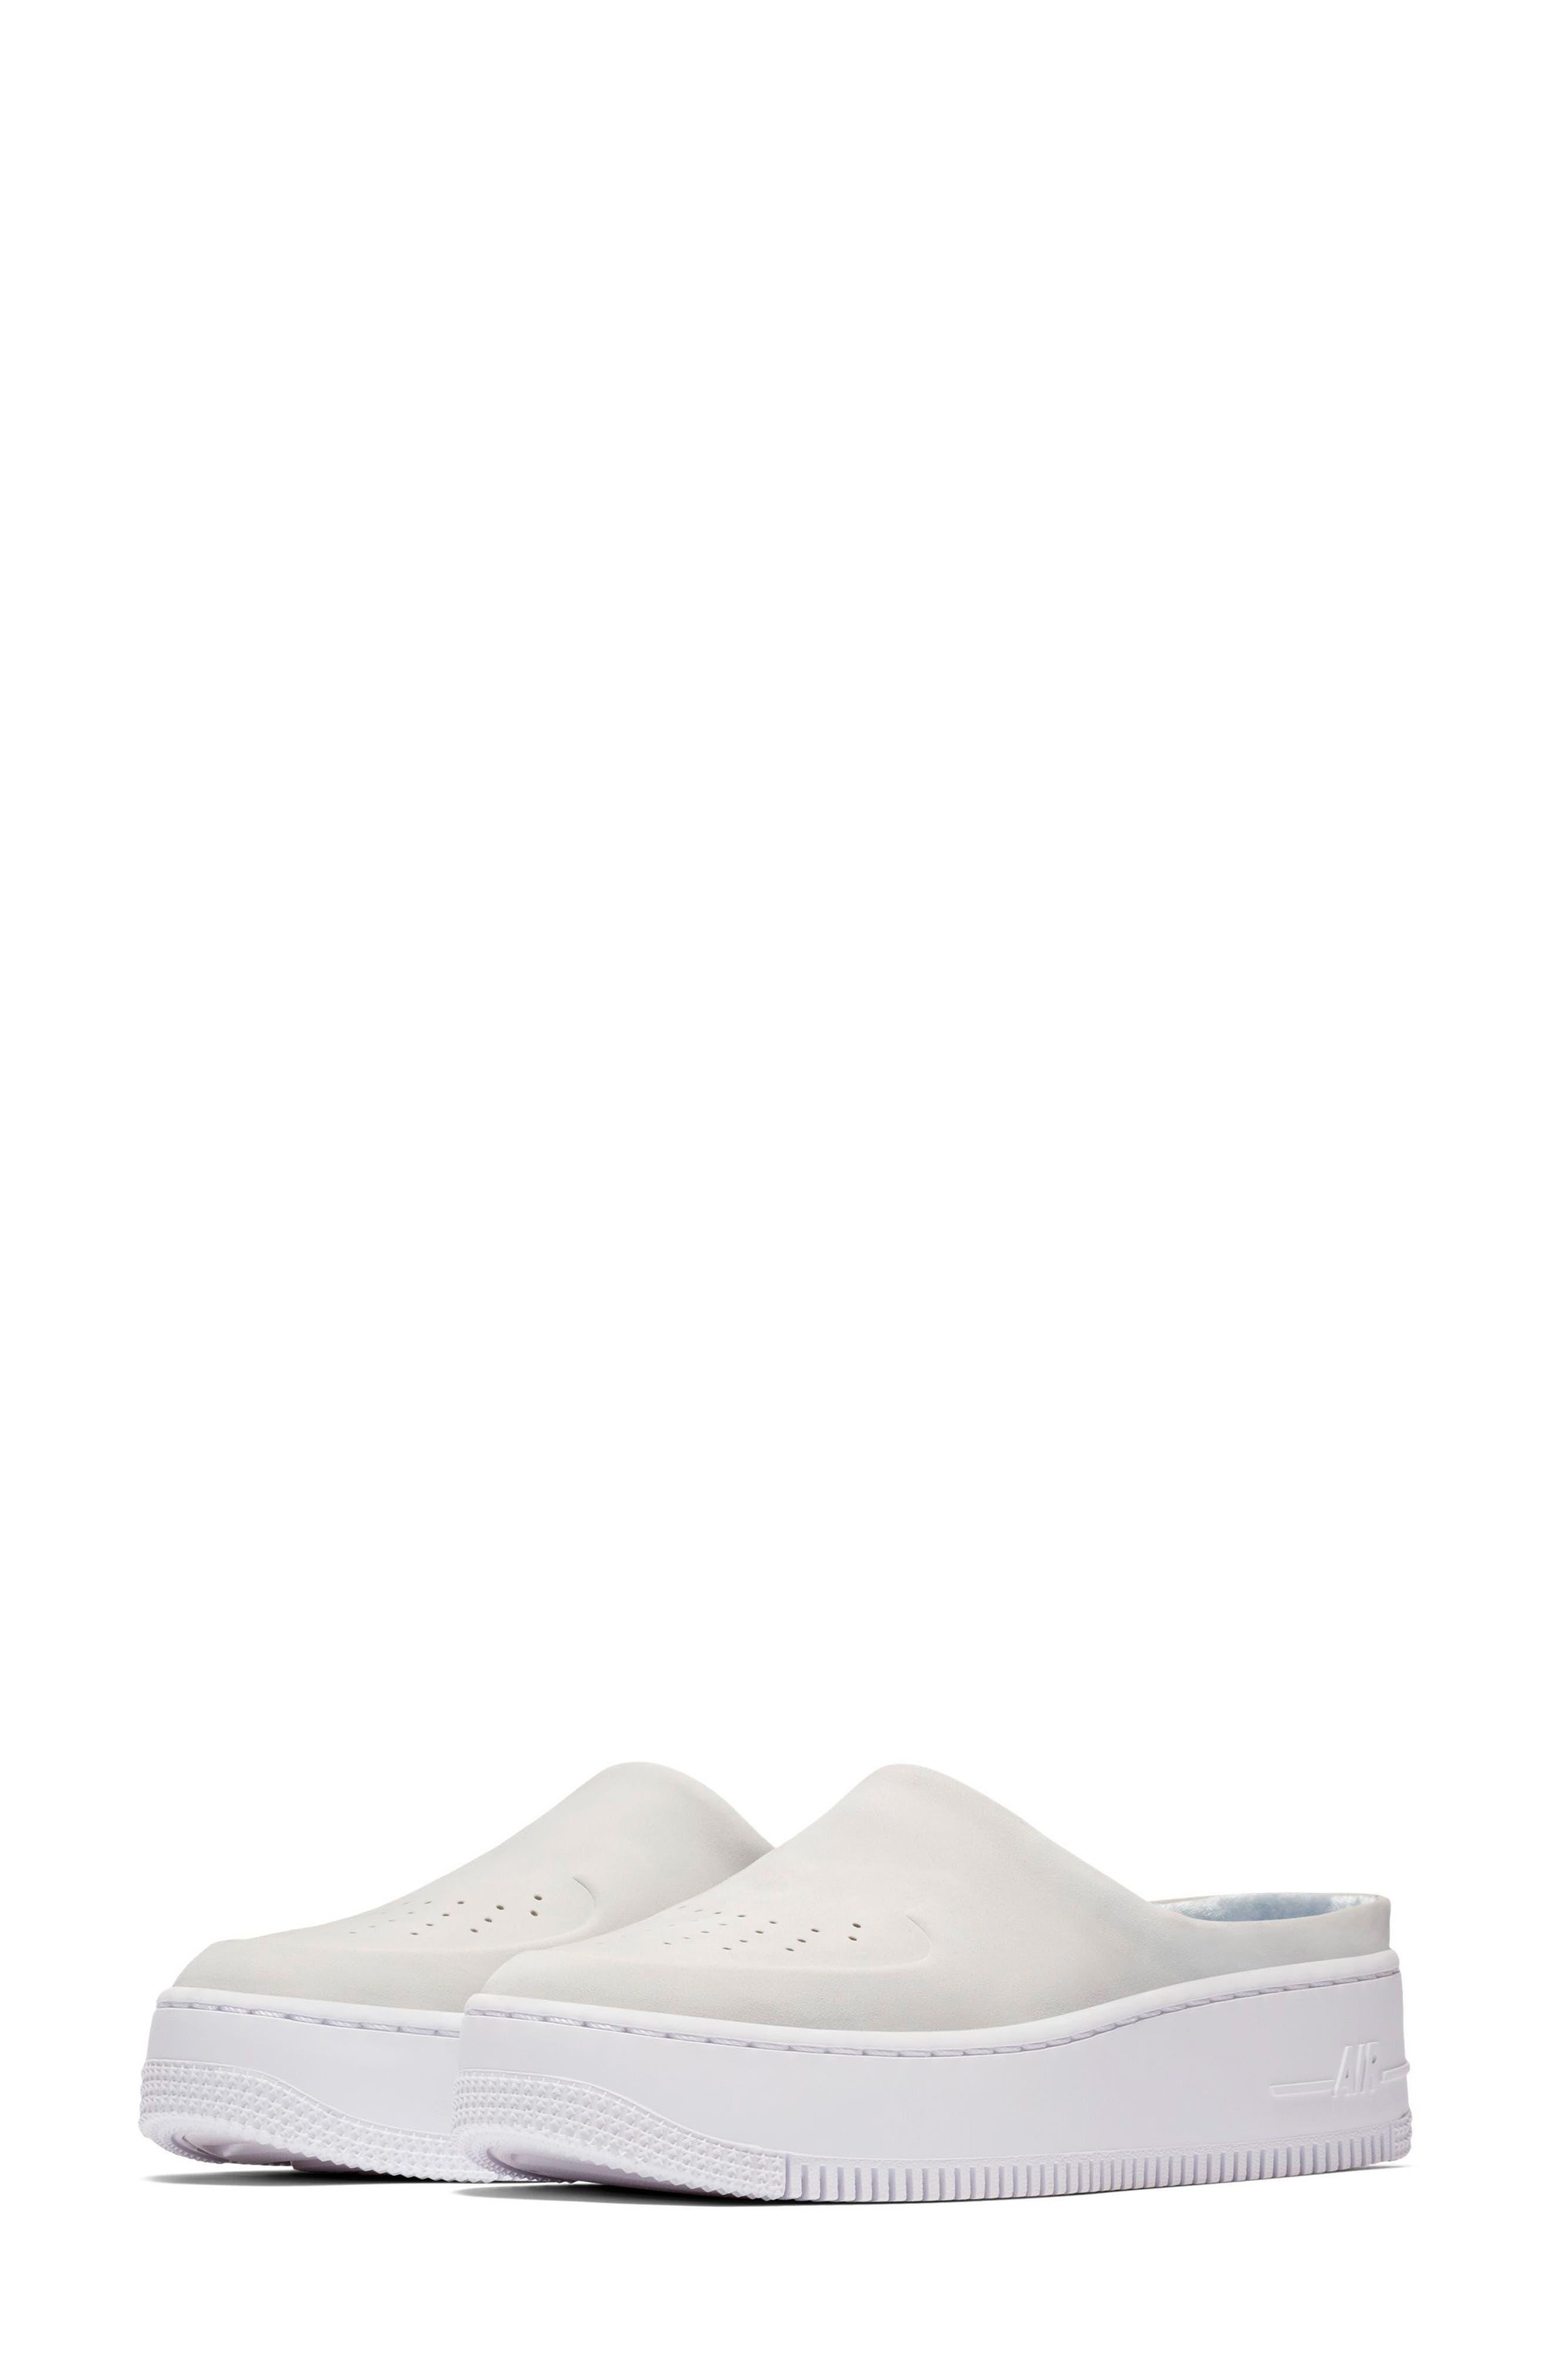 Air Force 1 Lover XX Slip-On Mule Sneaker,                         Main,                         color,